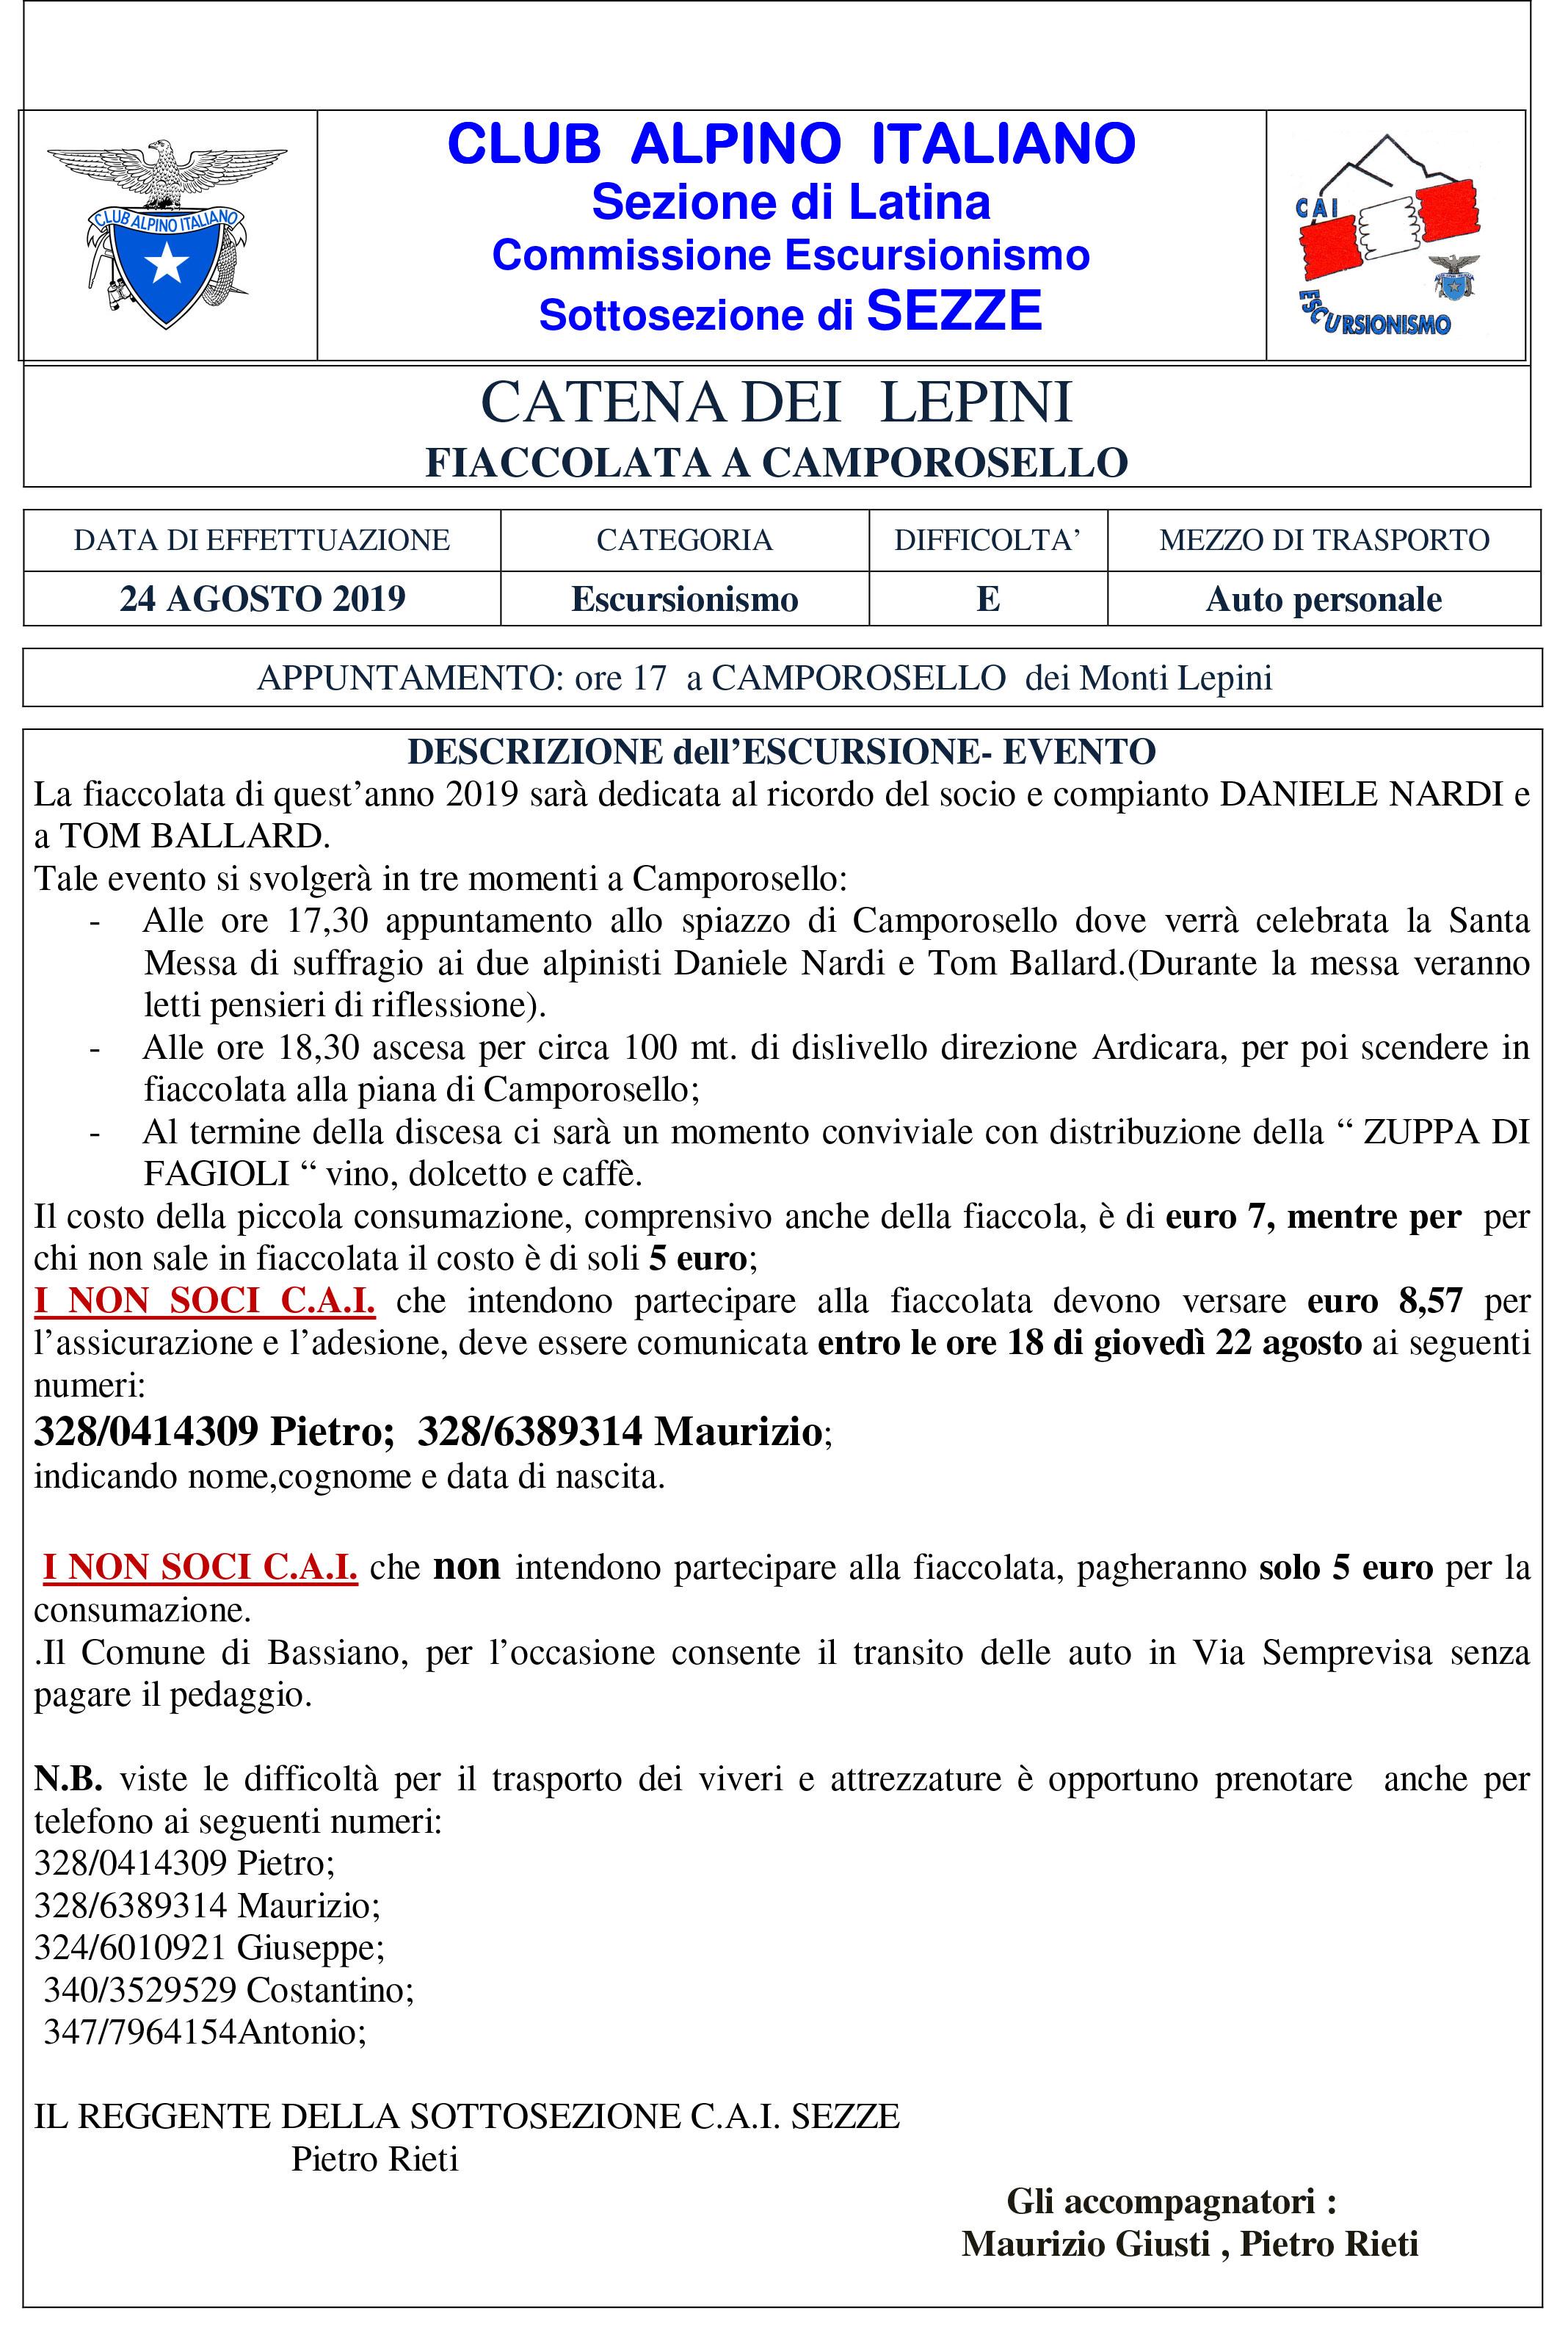 Sezze: Fiaccolata a Camporosello @ Camporosello | Sezze | Lazio | Italia